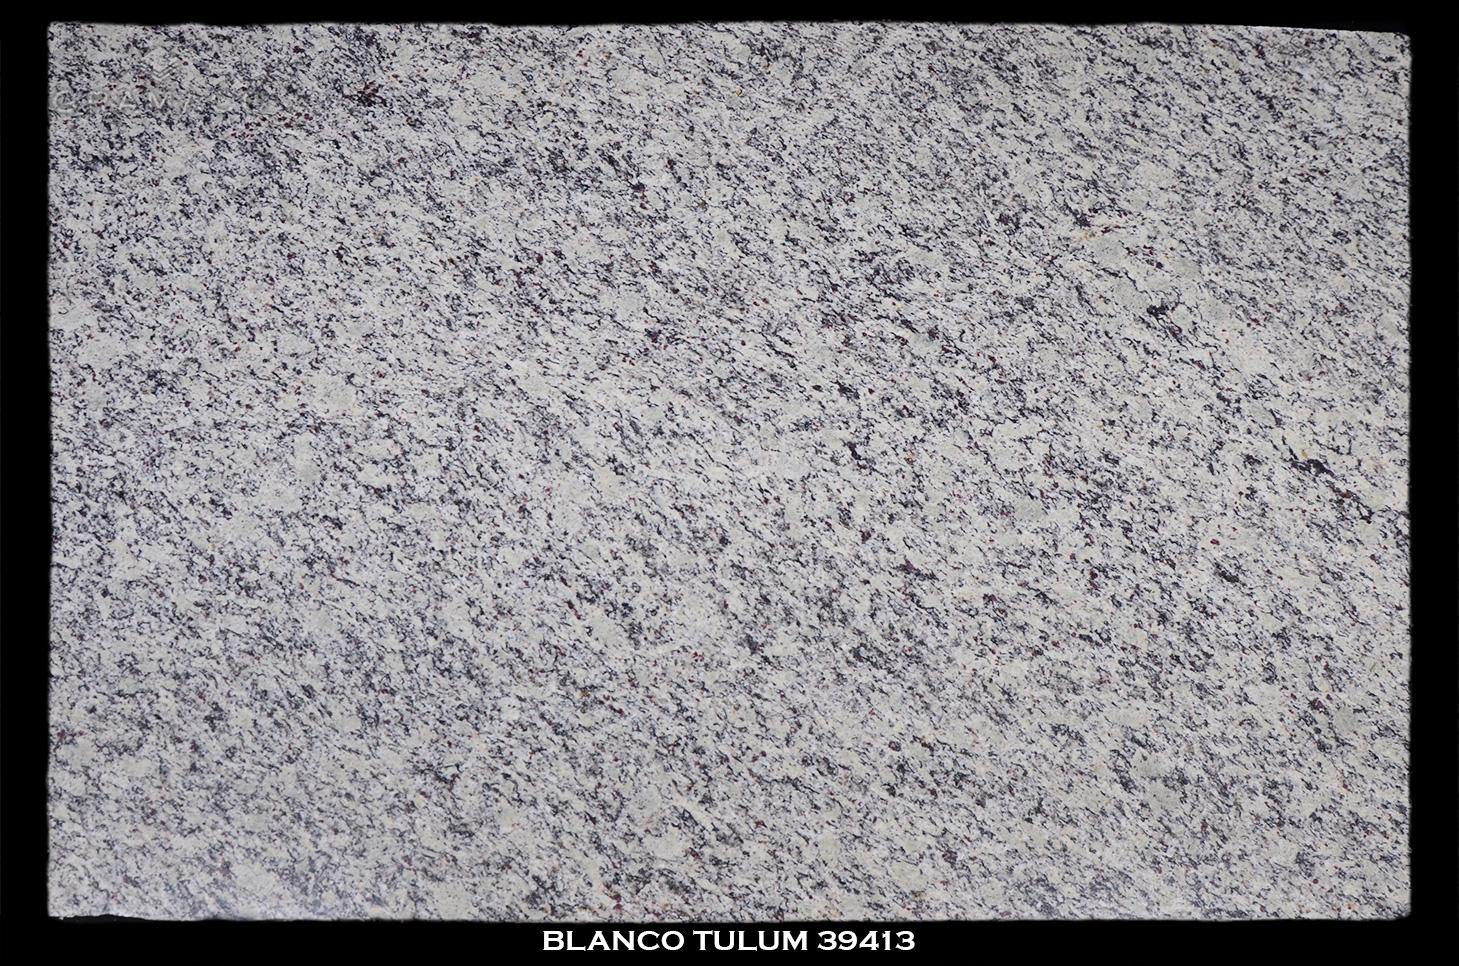 Blanco-Tulum-39413-slab